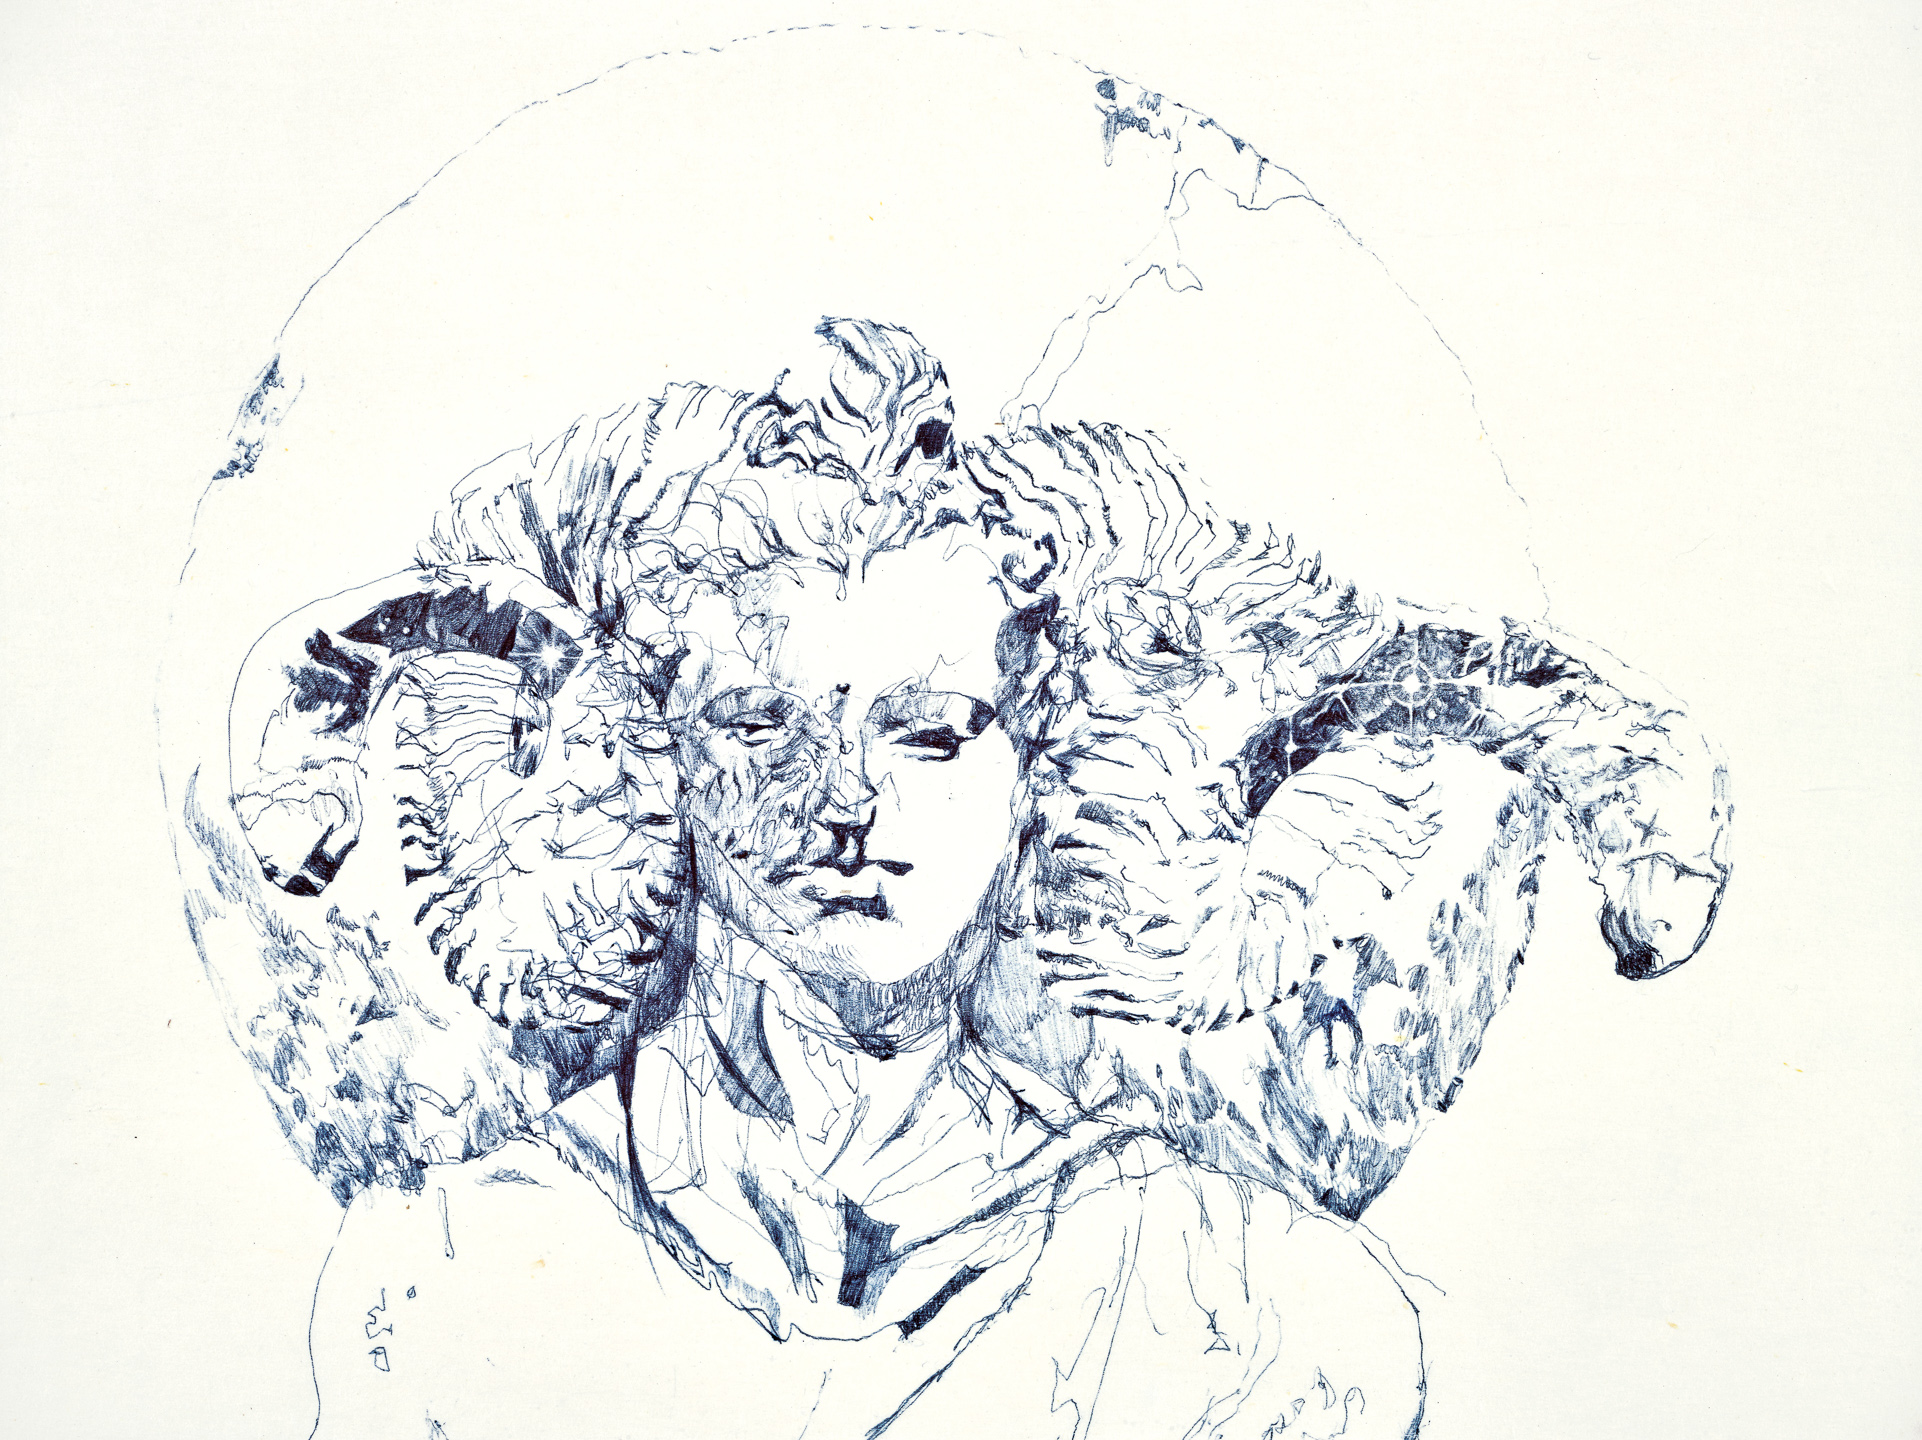 Dauntlessly - Charlie Buddha 2, detail 1